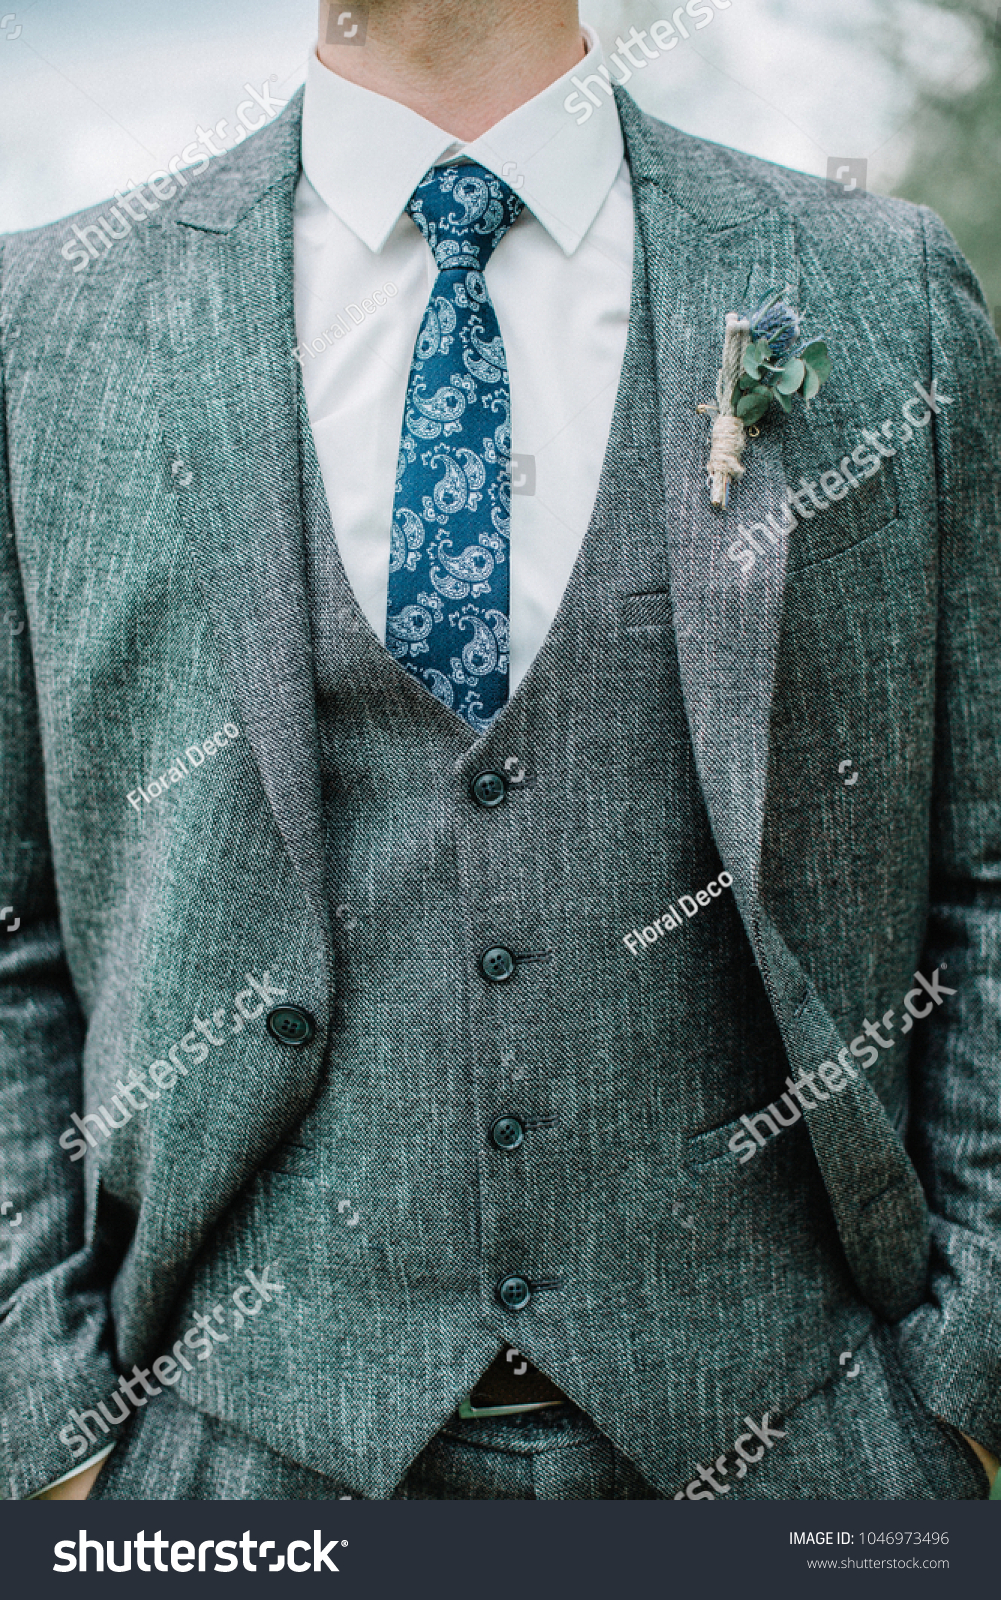 Groom Grey Suit Wedding Fashion Concept Stock Photo 1046973496 ...